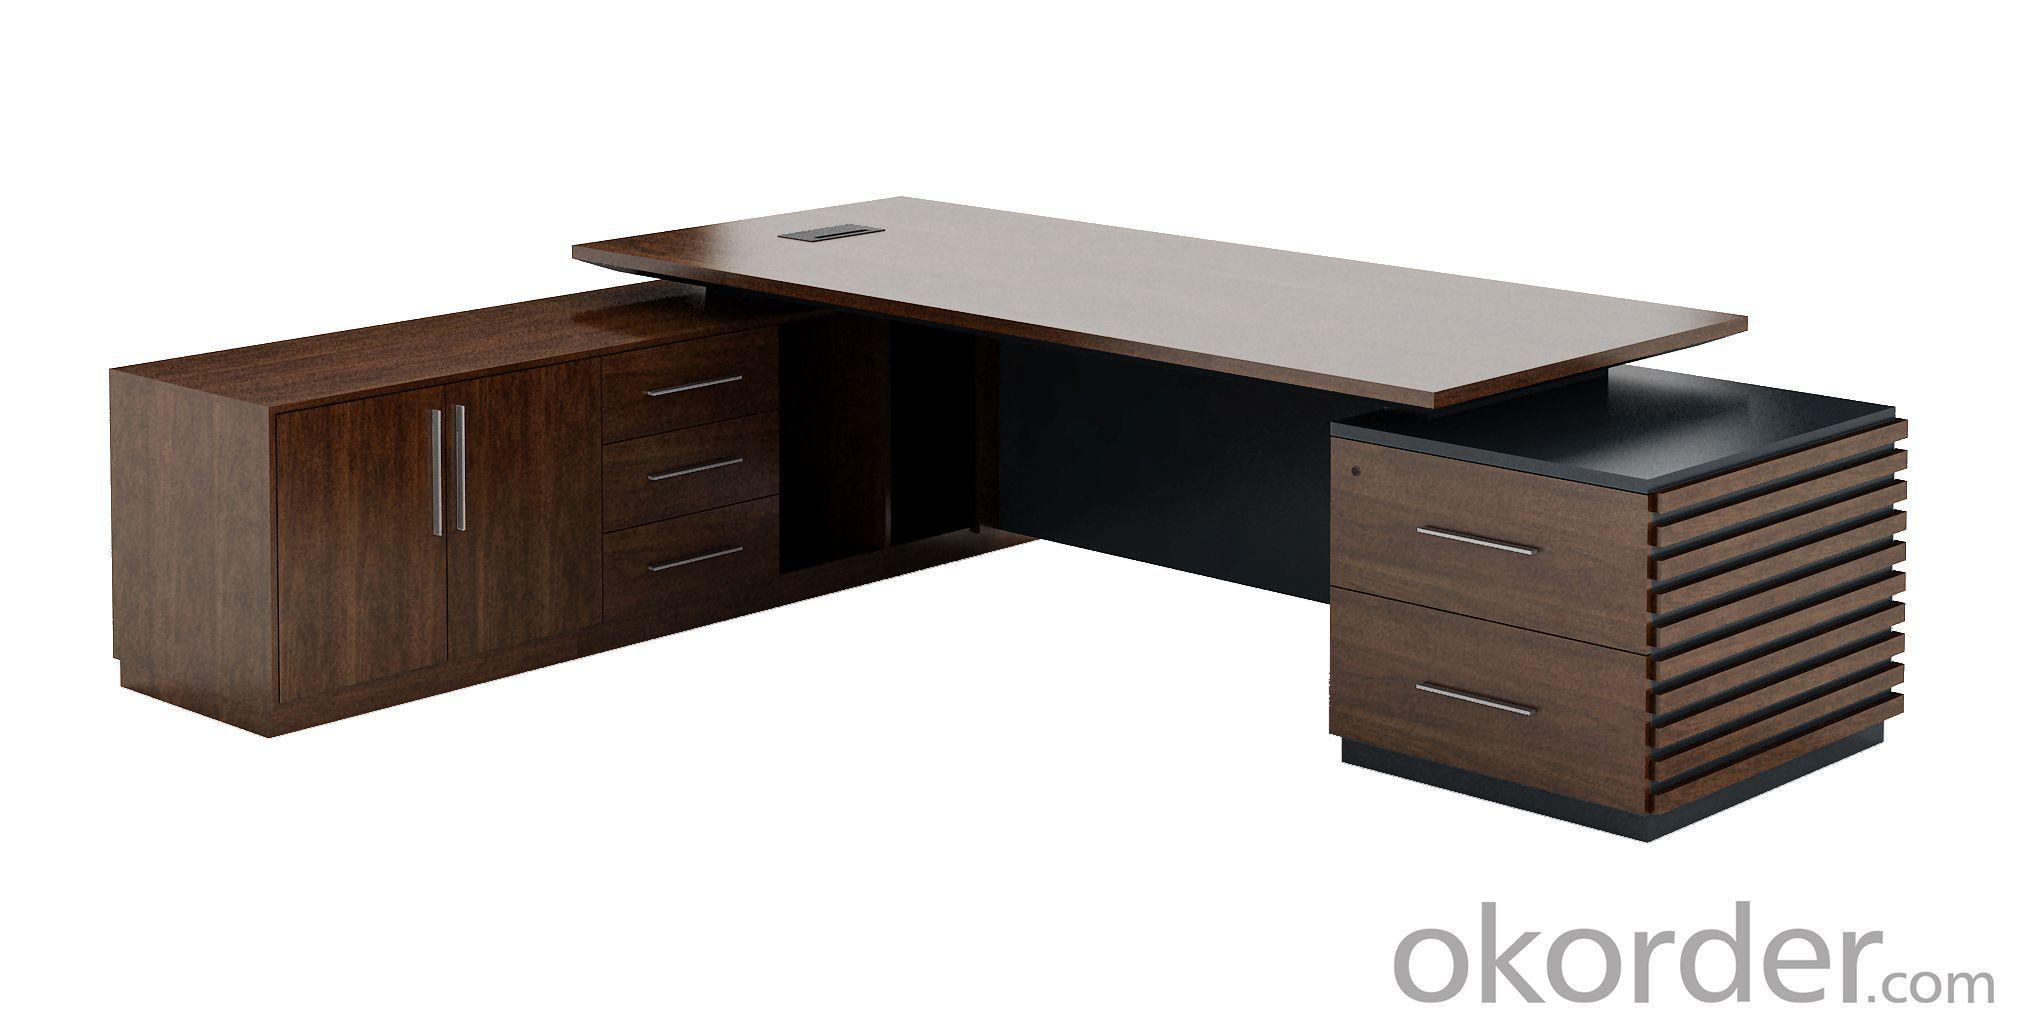 mdf furniture design. Office Furniture Desk Table MDF Board Material Mdf Design M